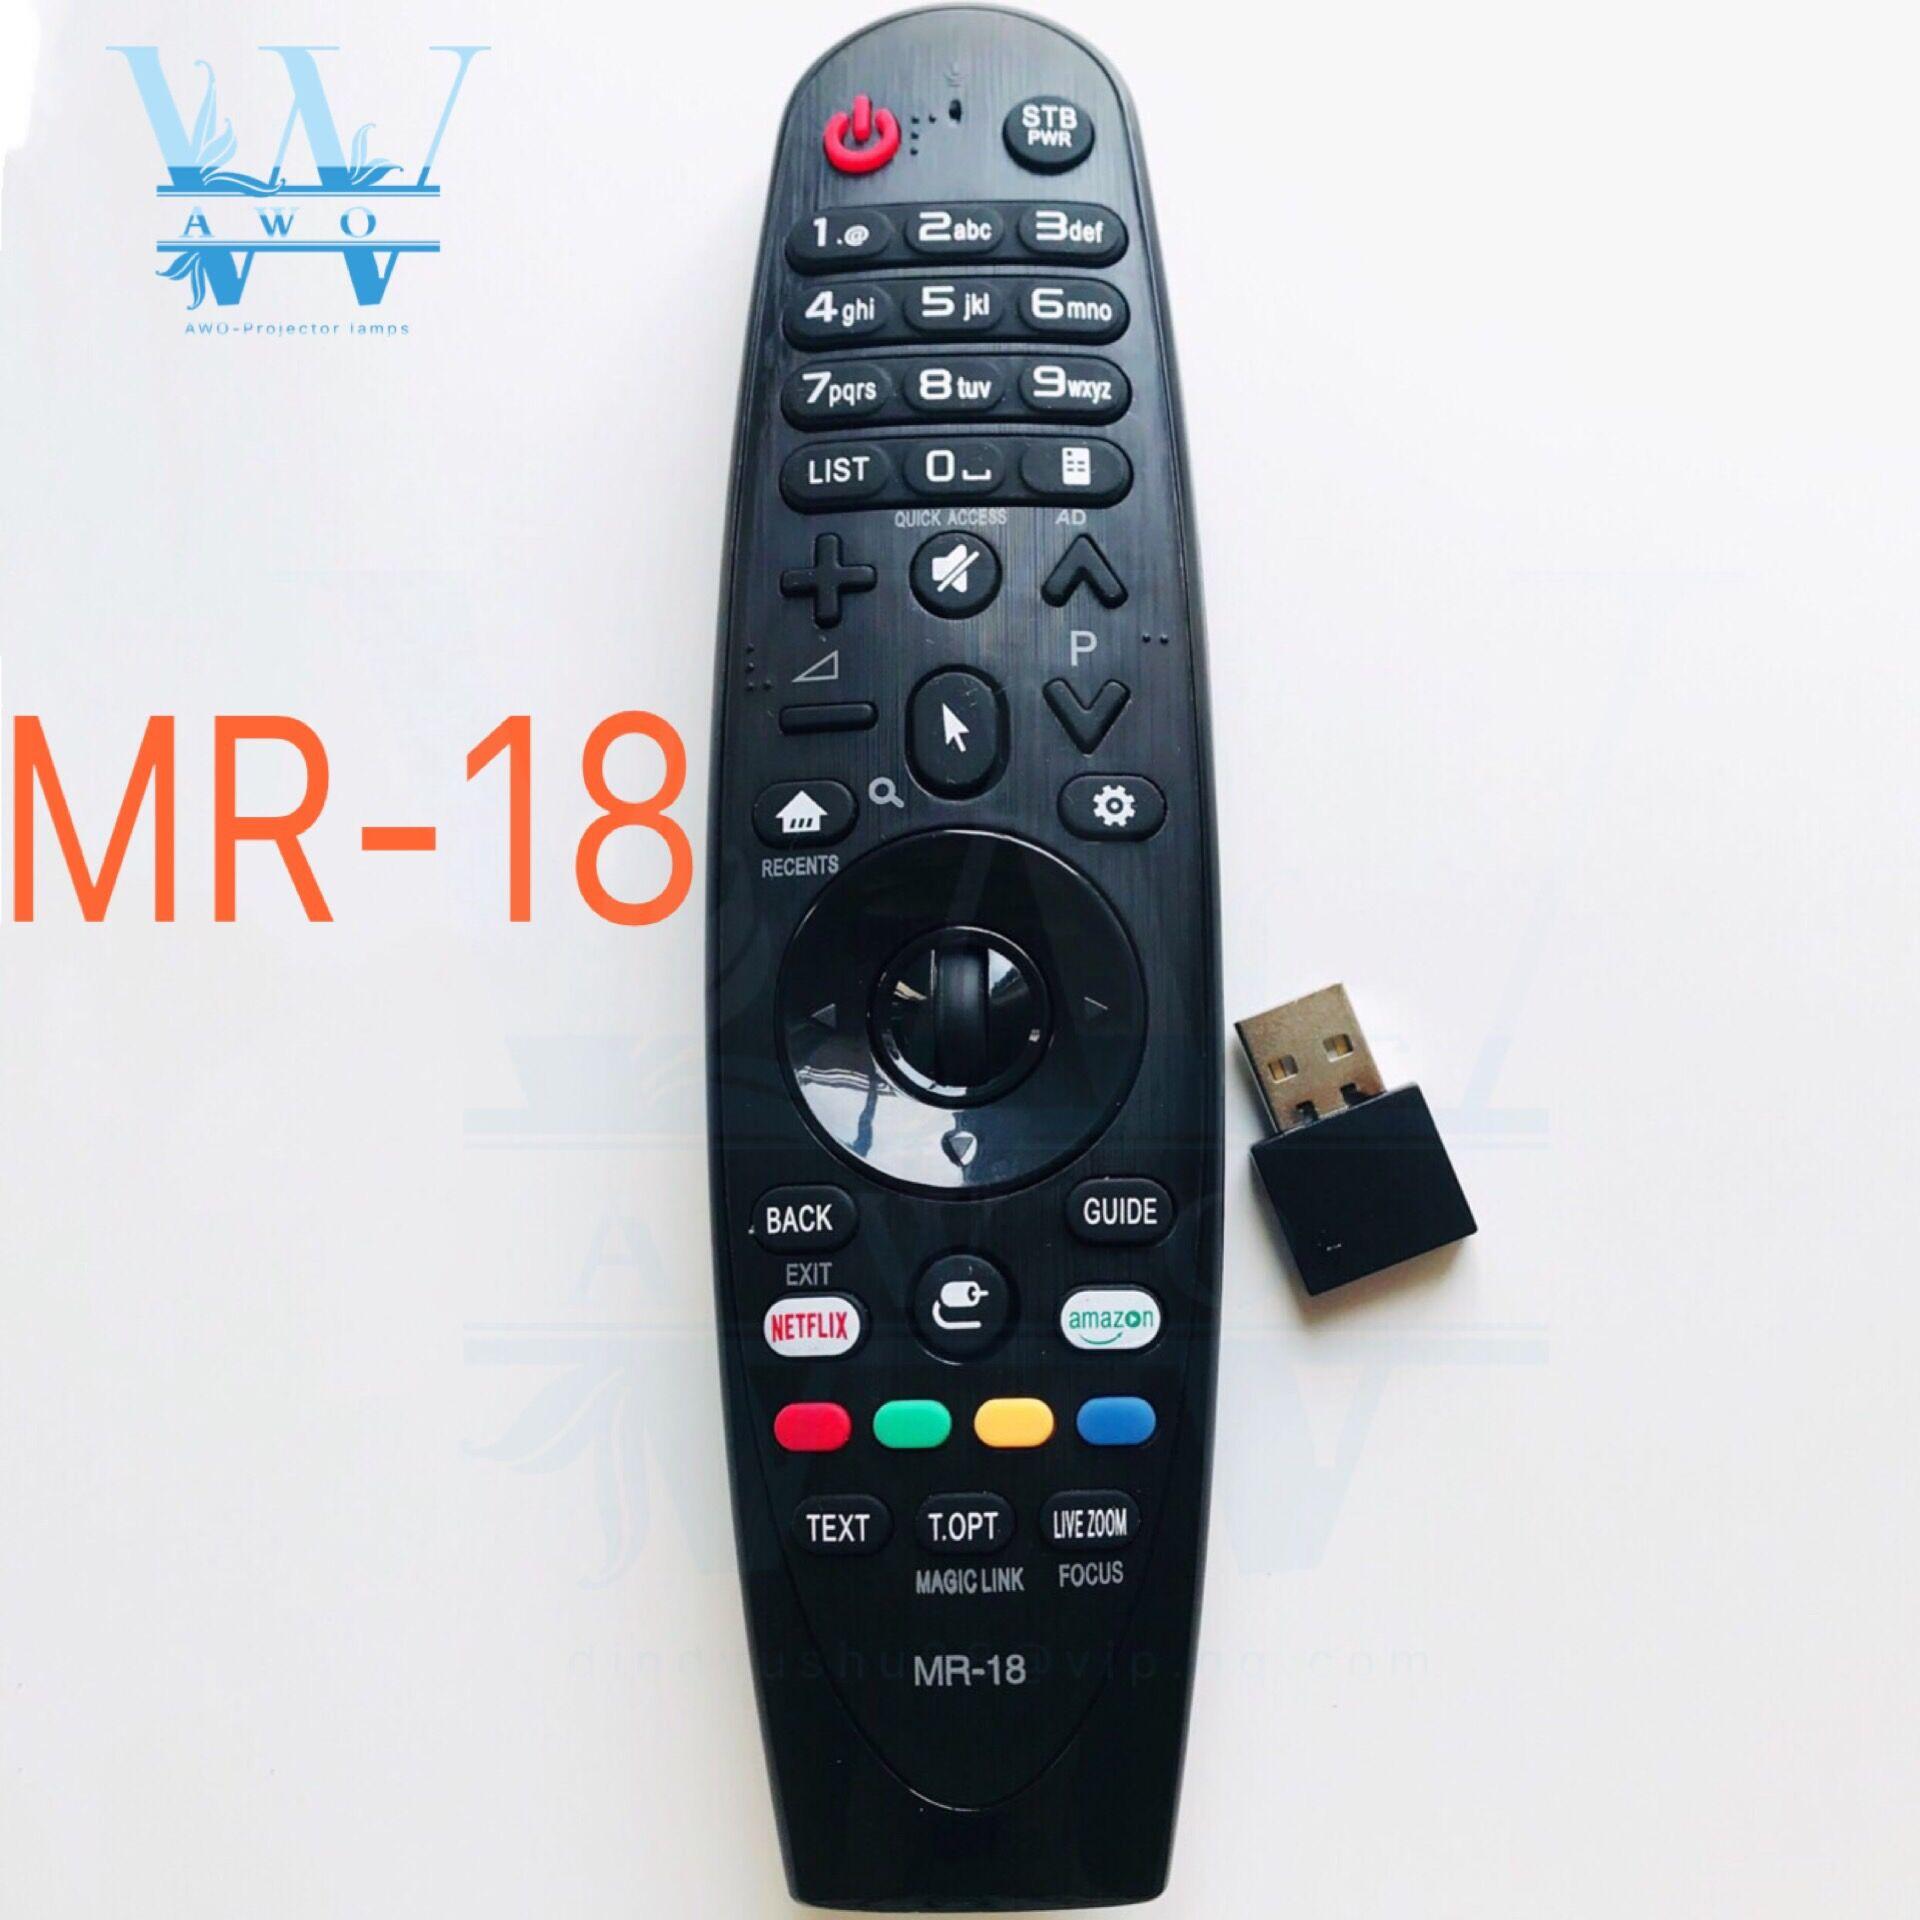 Control remoto inteligente Universal para LG TV OLED65B7A OLED65B7P OLED55B7P OLED55C7P OLED65C7P 43UJ6560 43UJ6560, 49UJ6560